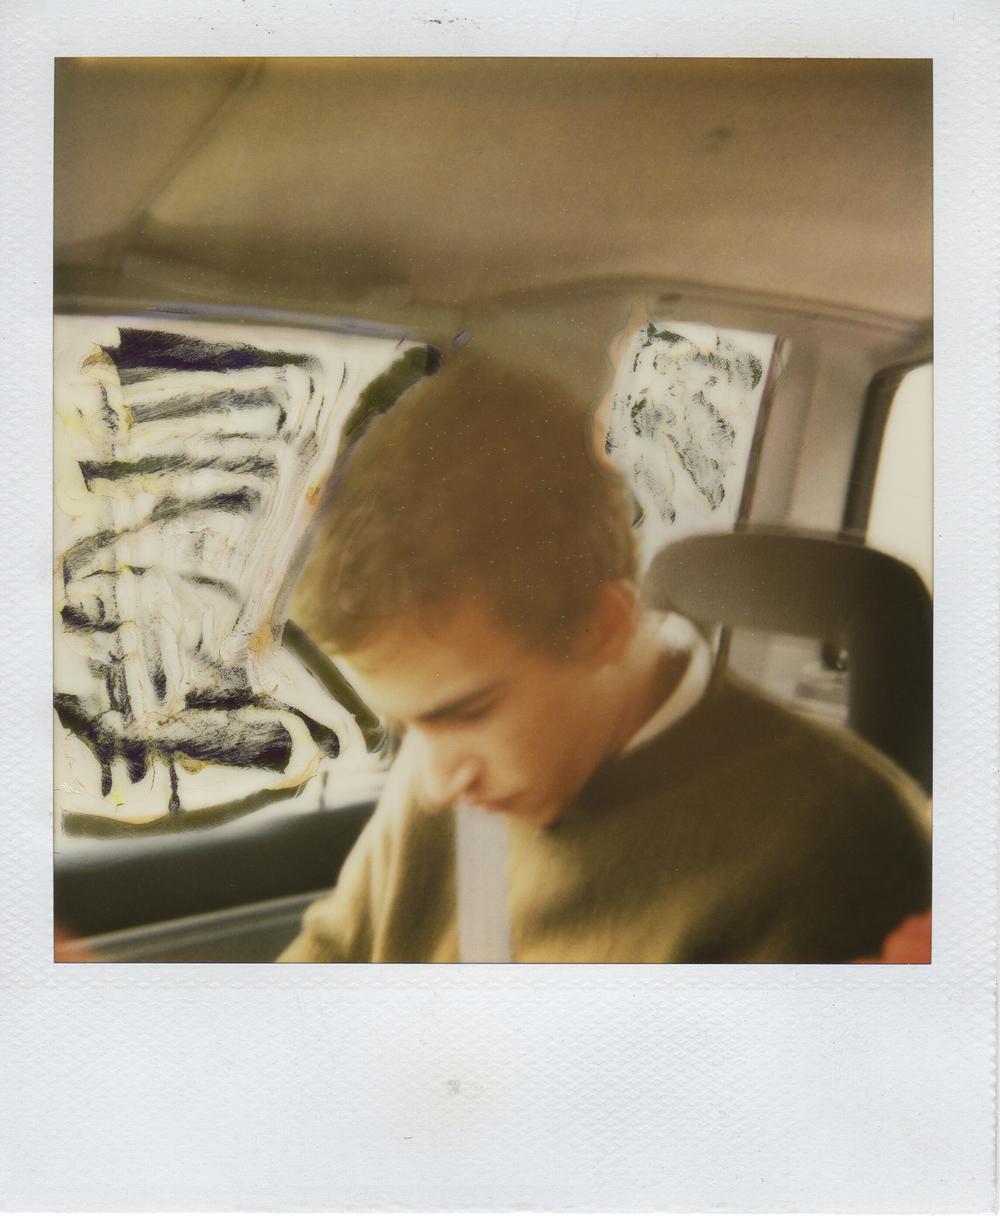 jlaurence-polaroid-065.jpg